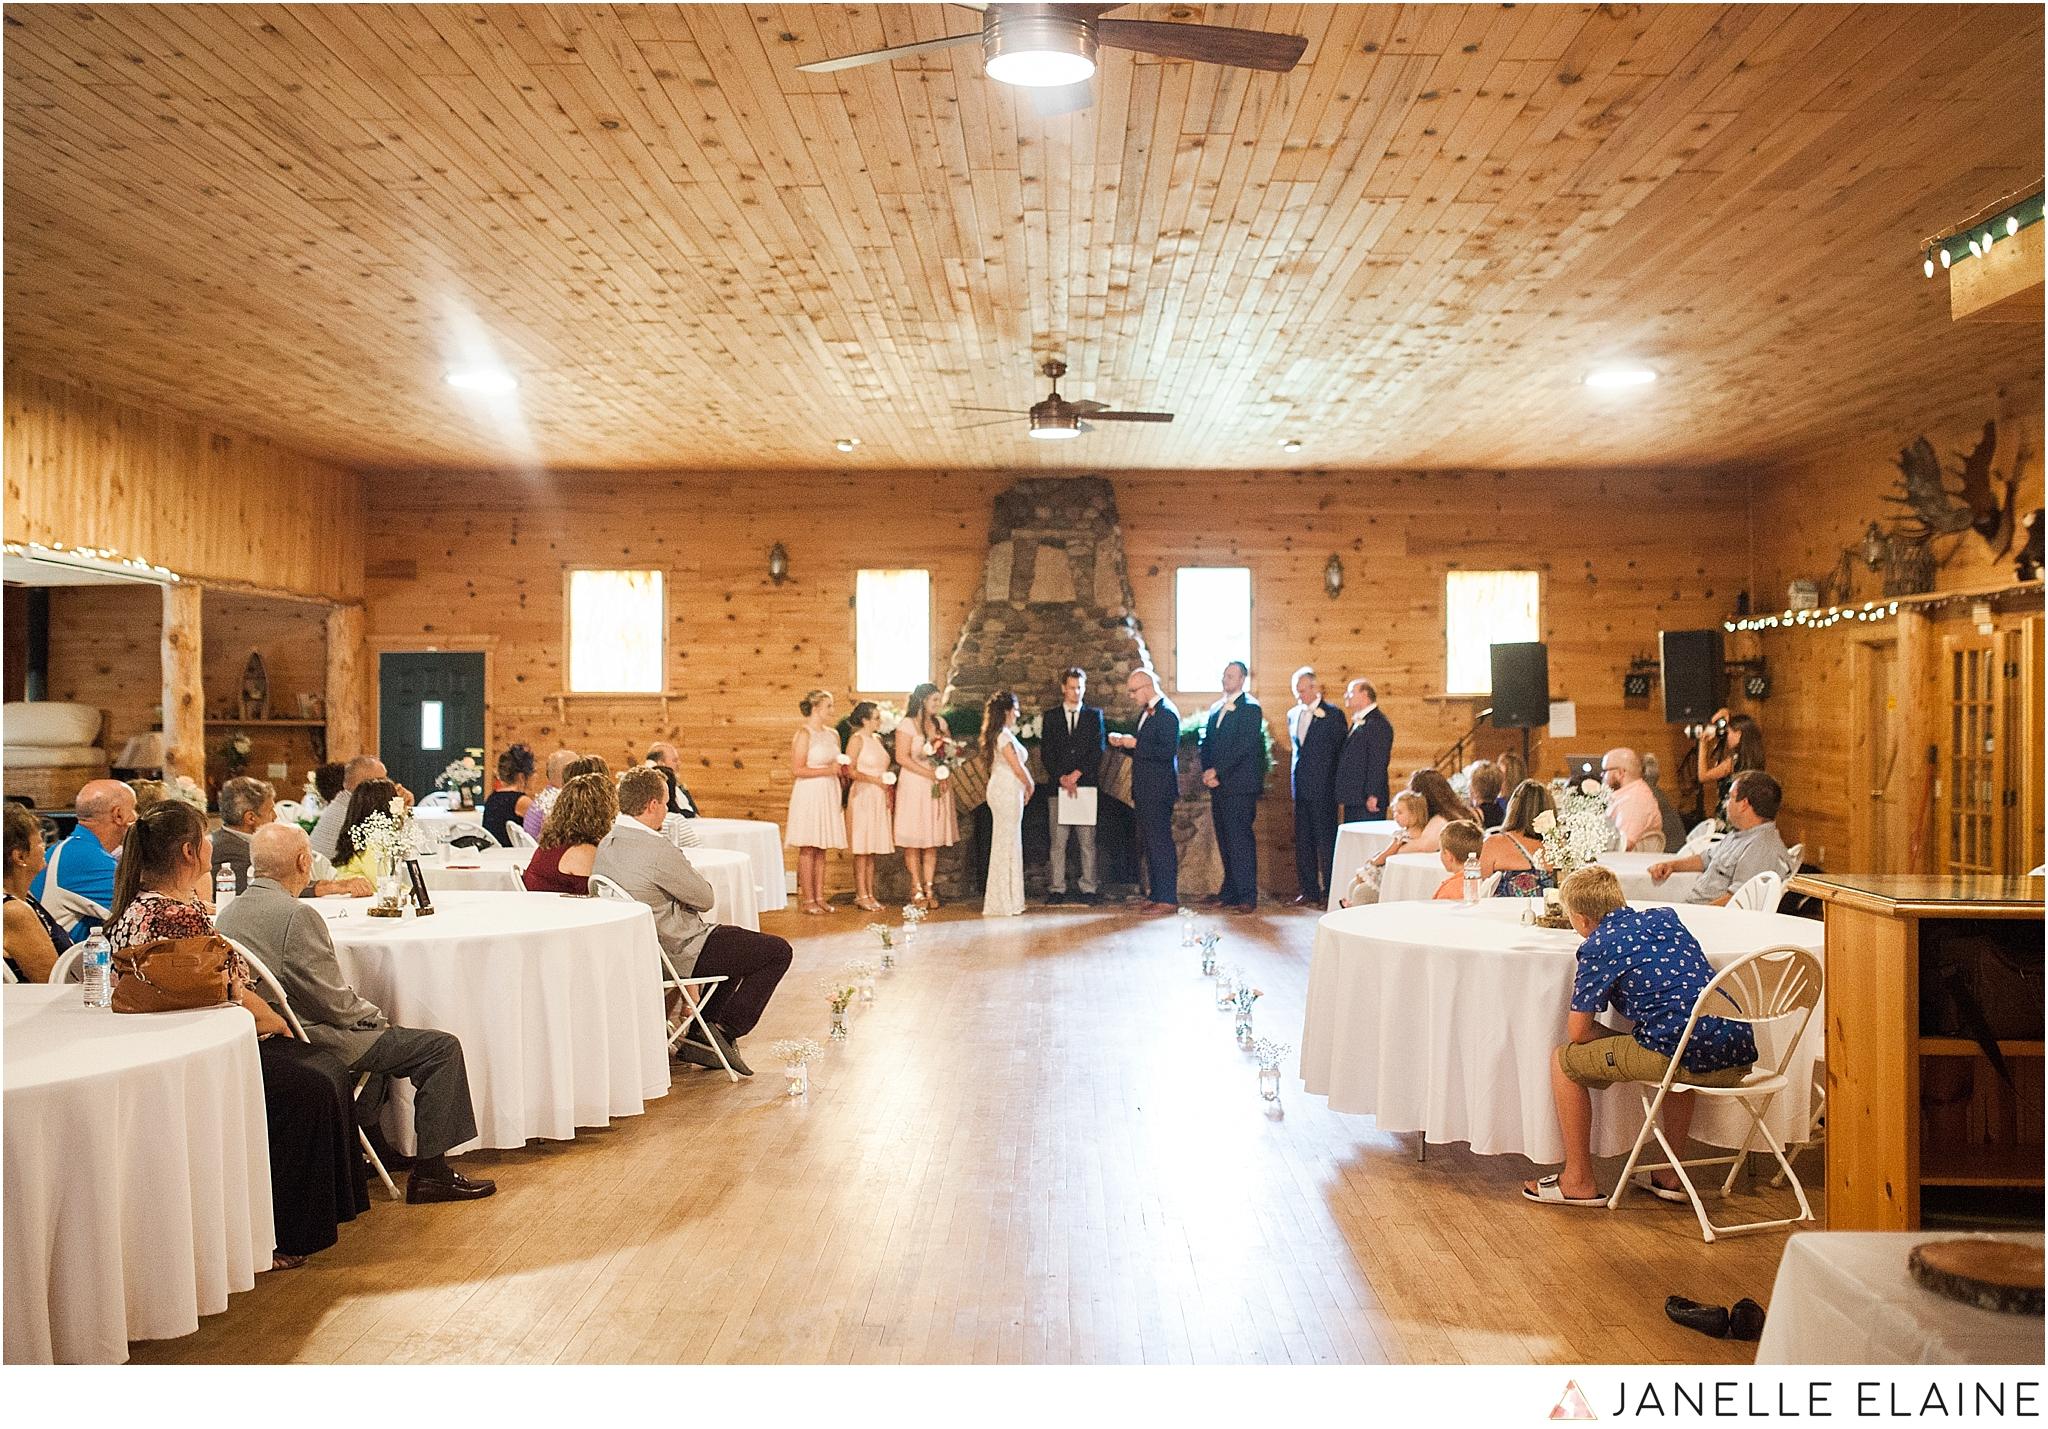 janelle elaine photography-seattle-destination-wedding-photographer-63.jpg